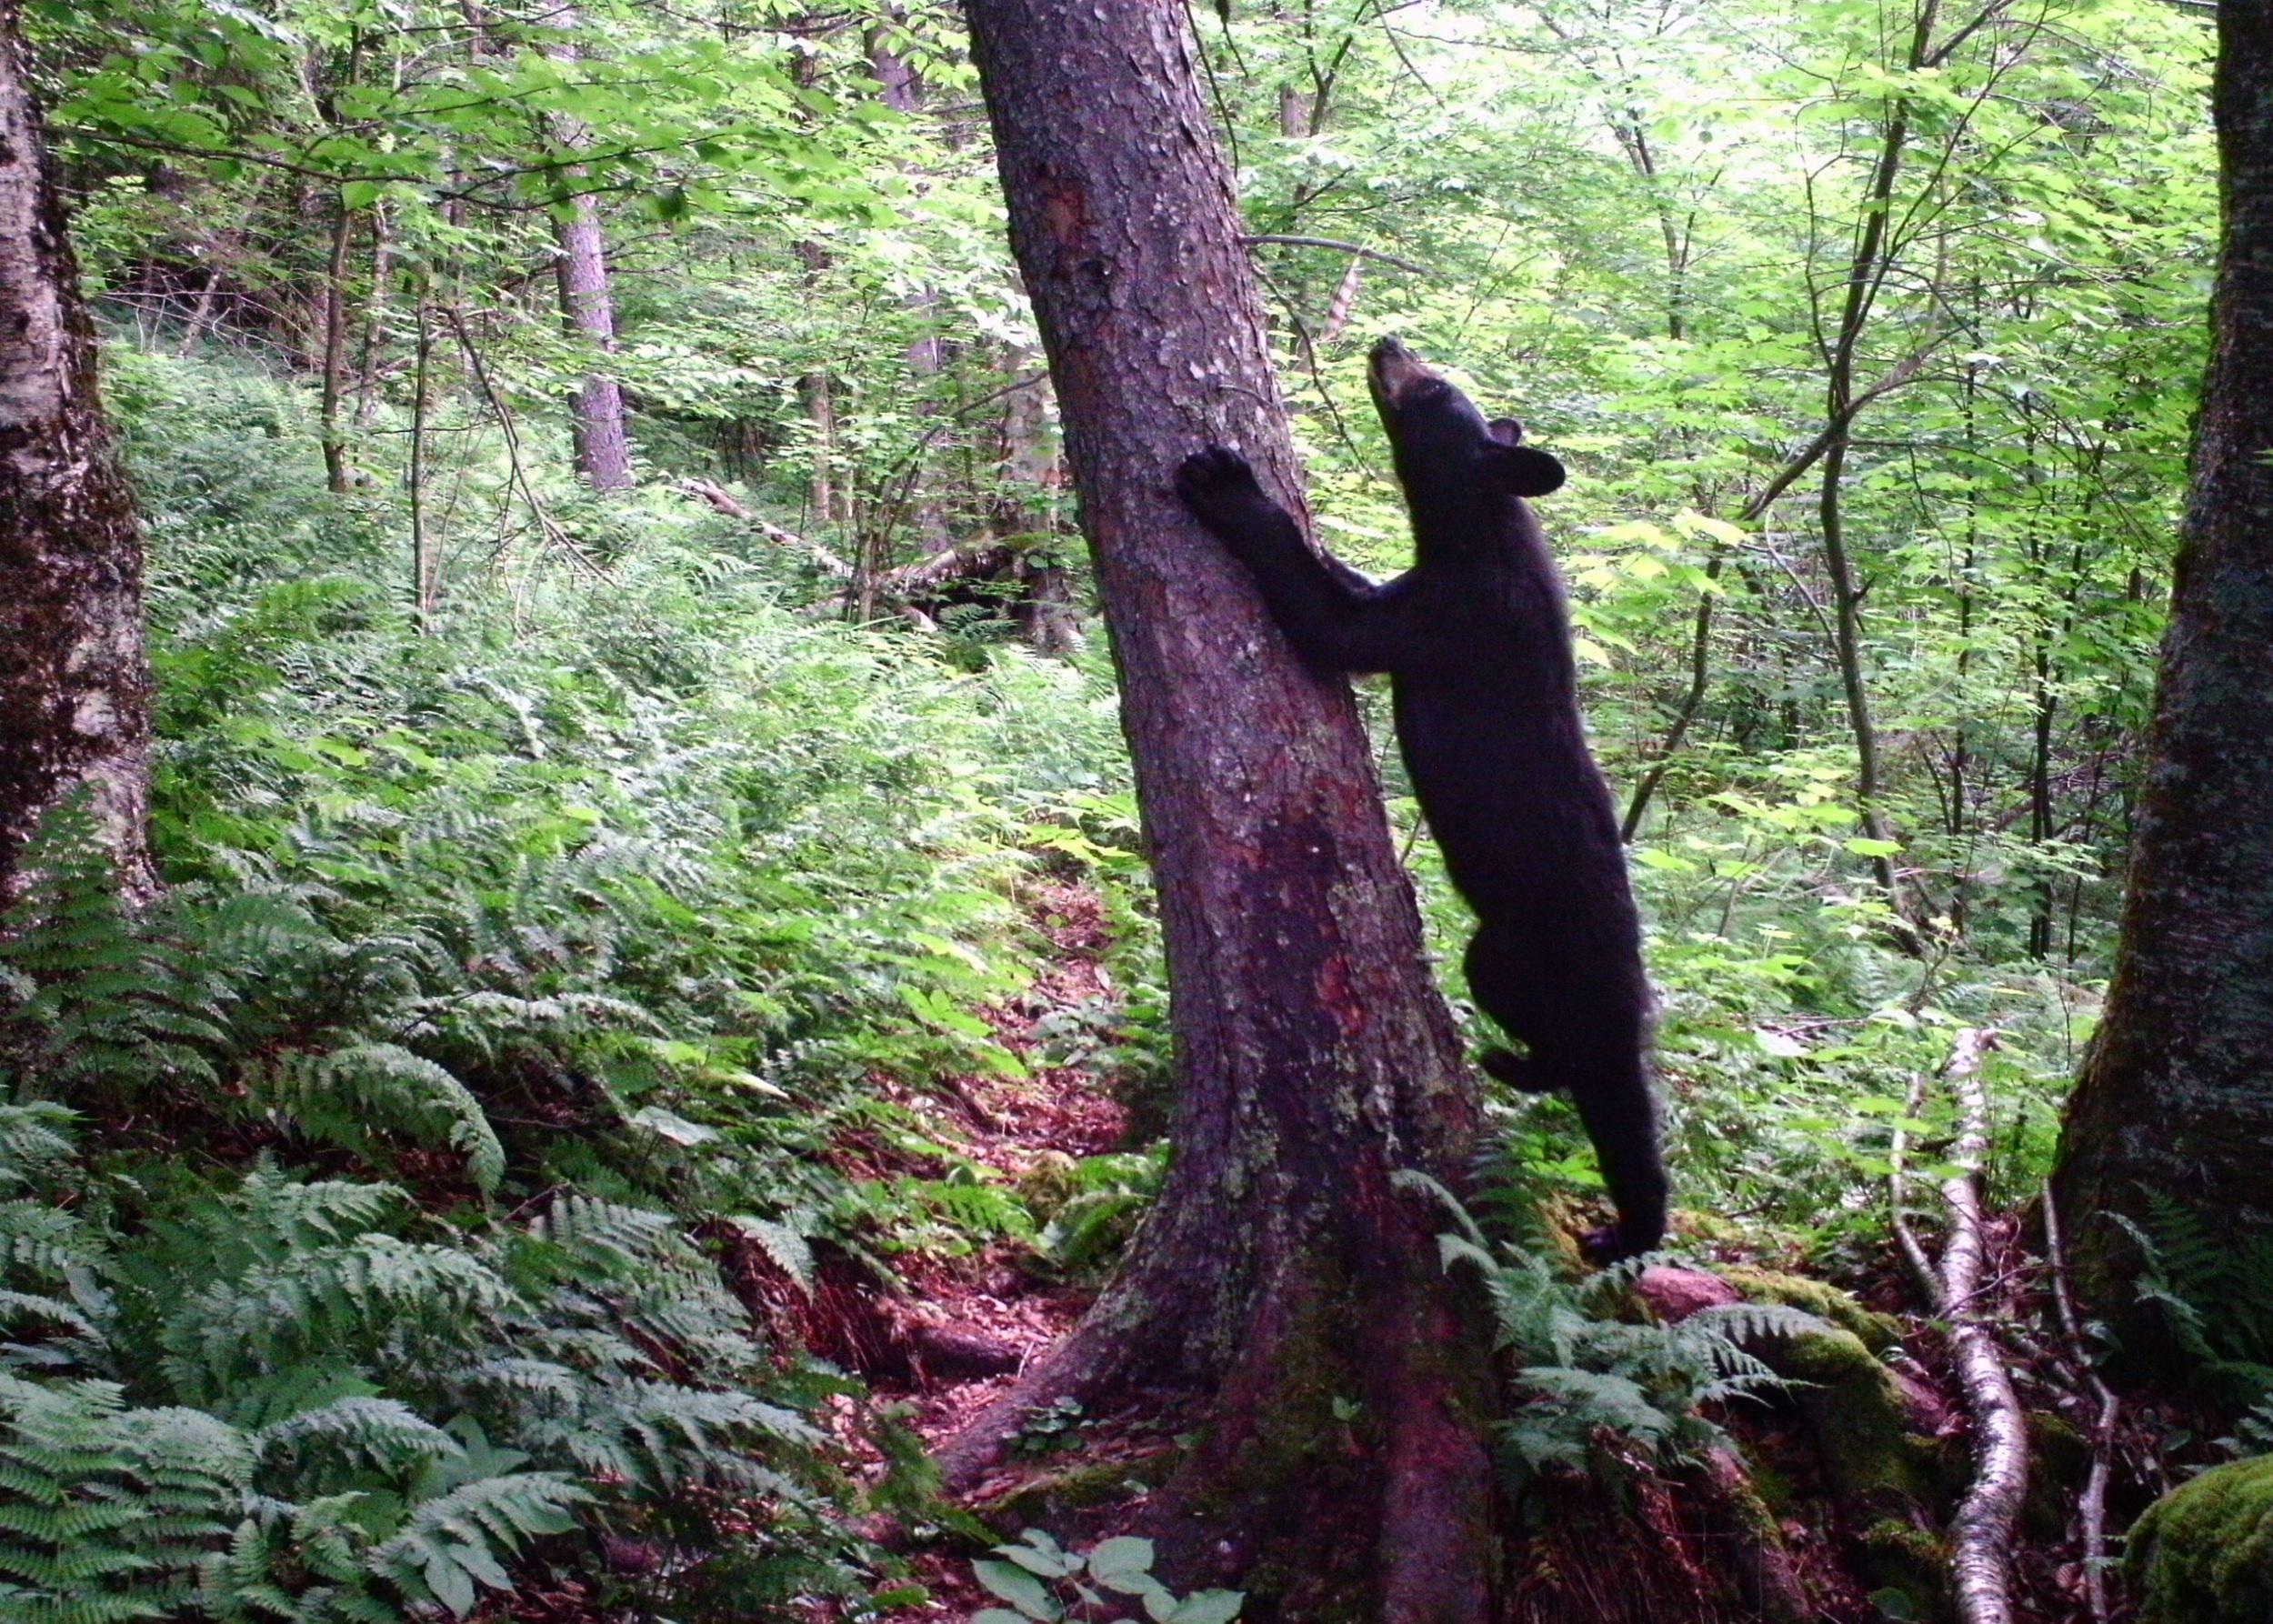 bear-cropped.jpg